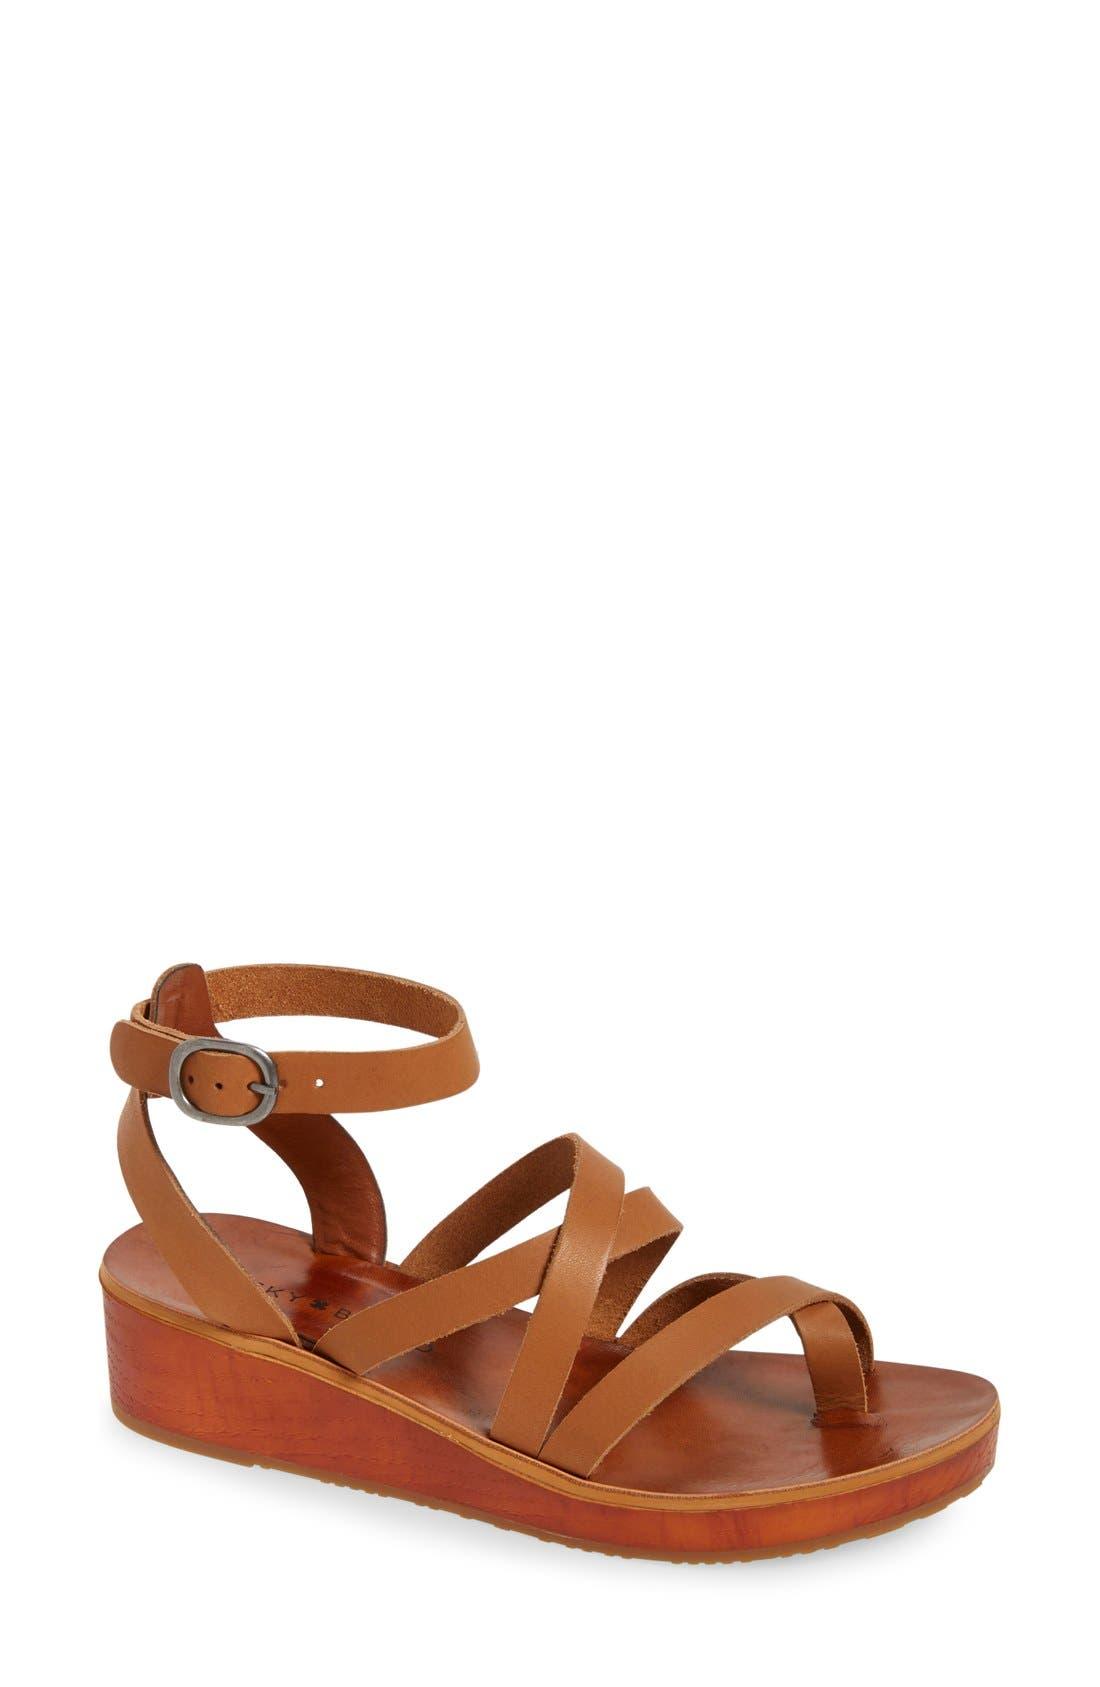 'Honeyy' Platform Sandal,                             Main thumbnail 4, color,